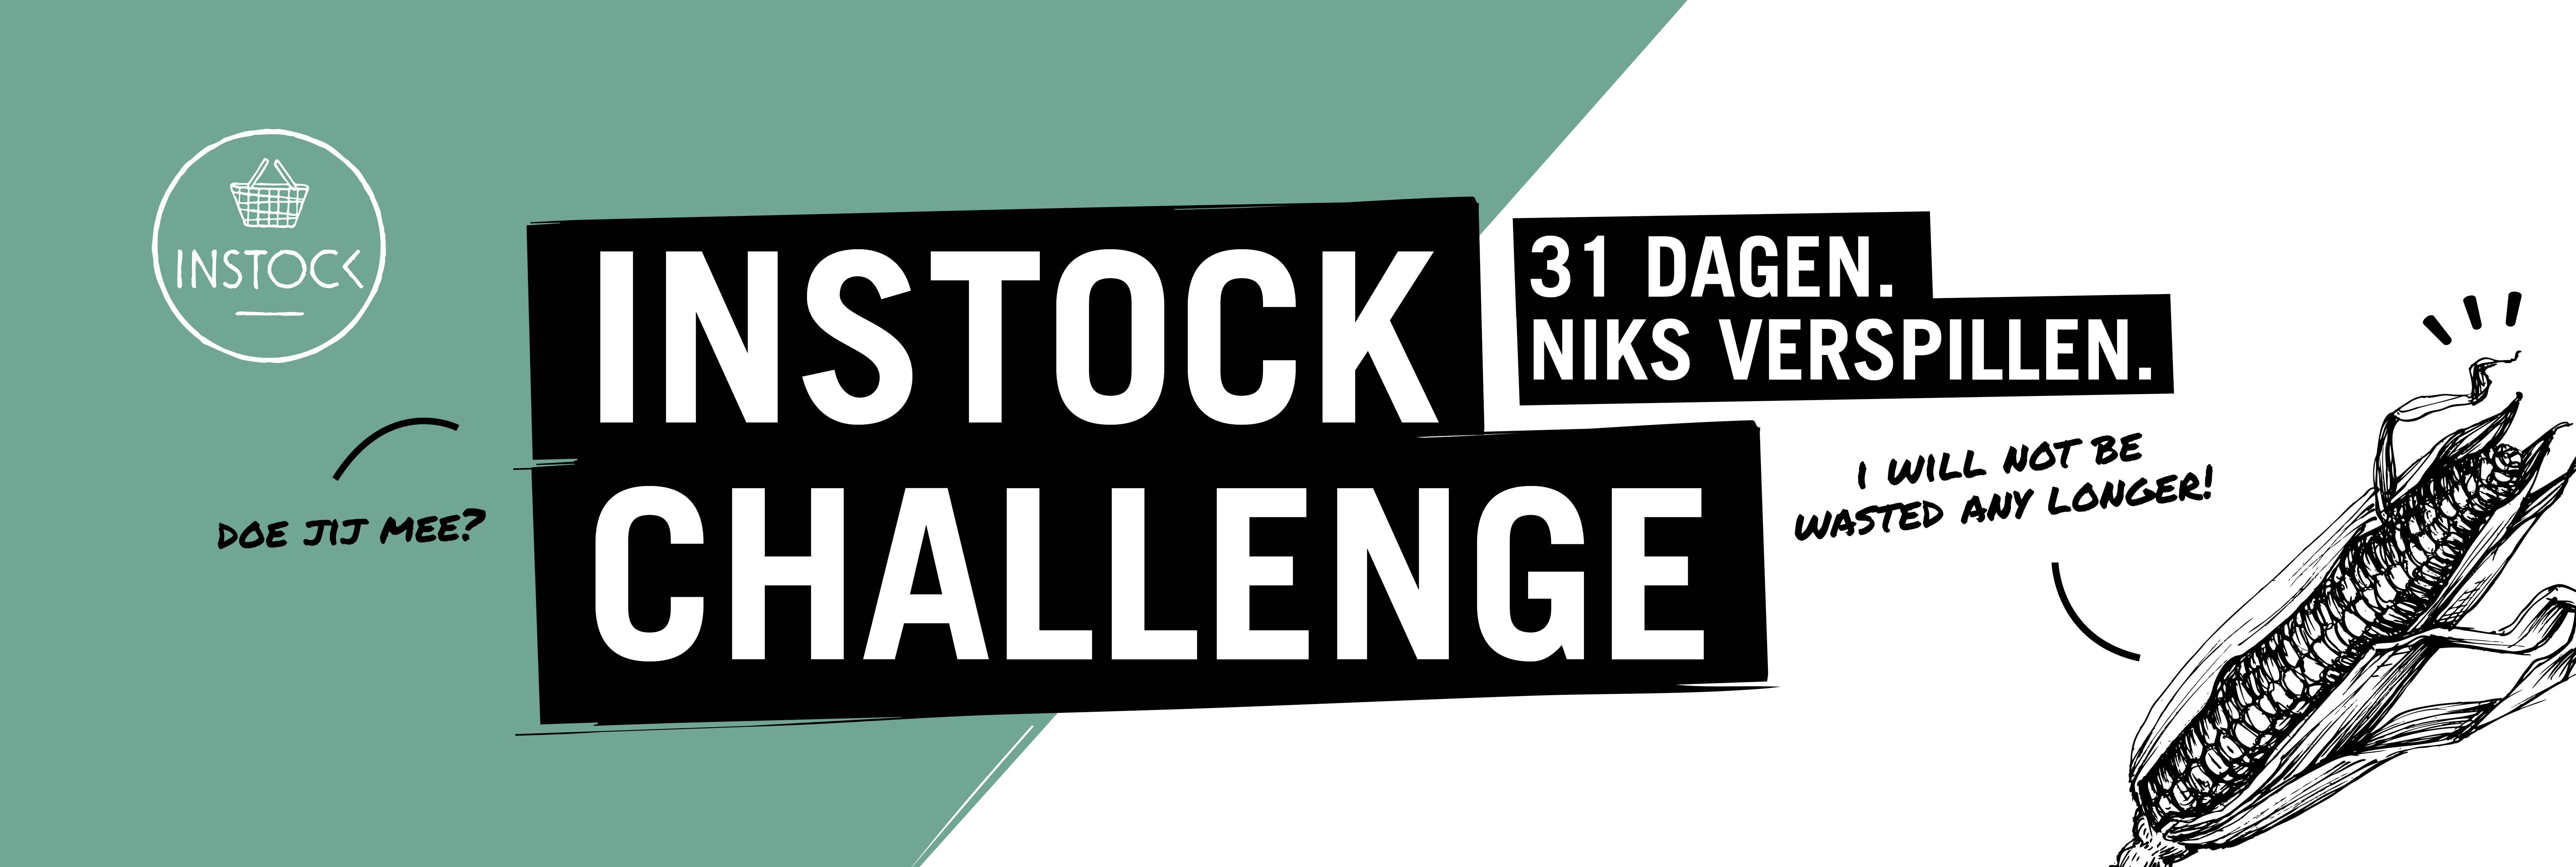 instock challenge